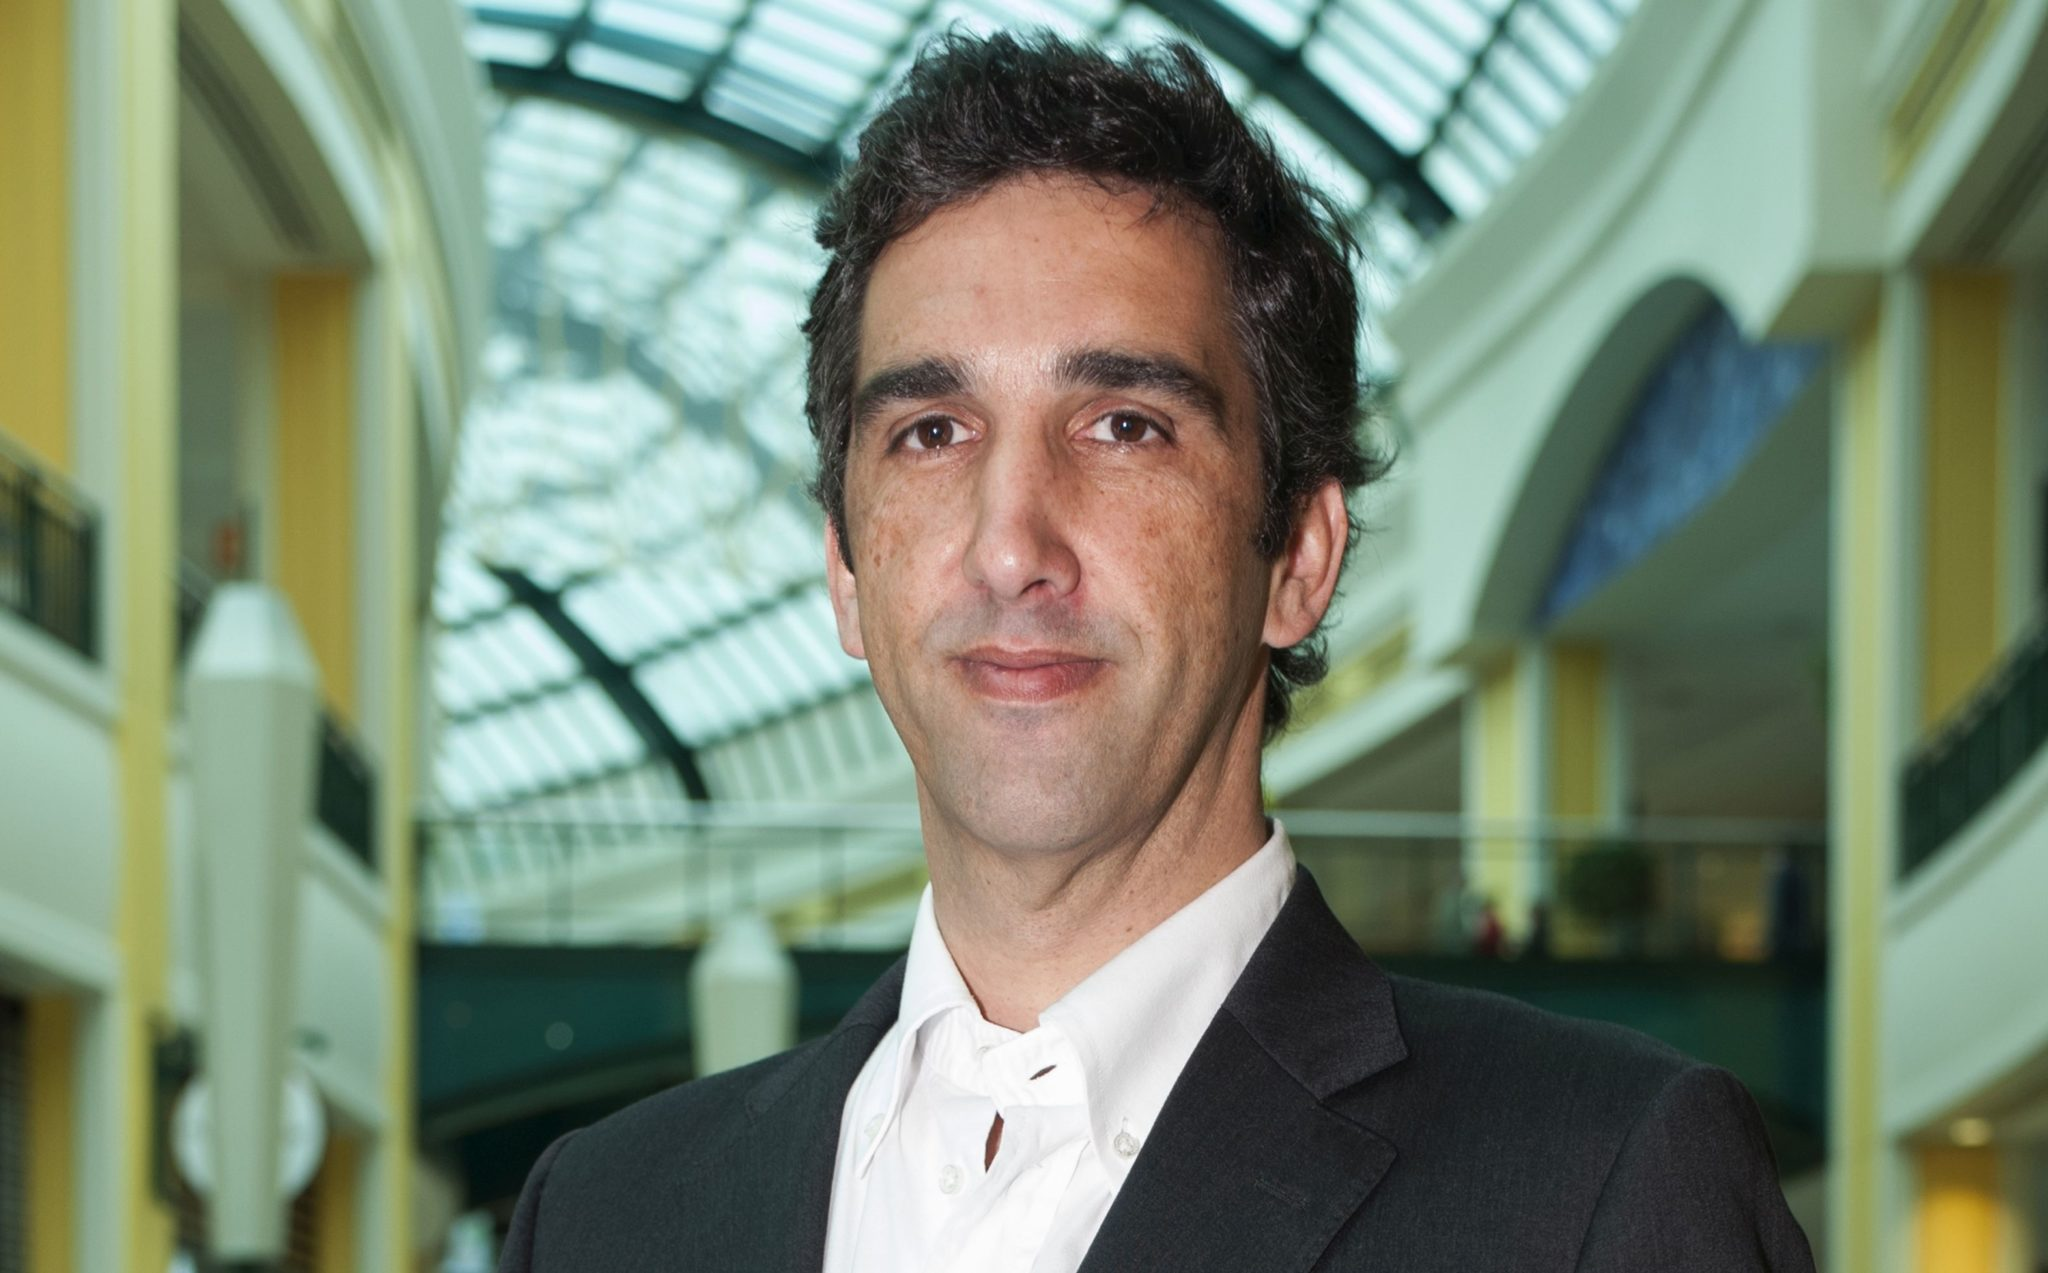 Jorge Morgadinho